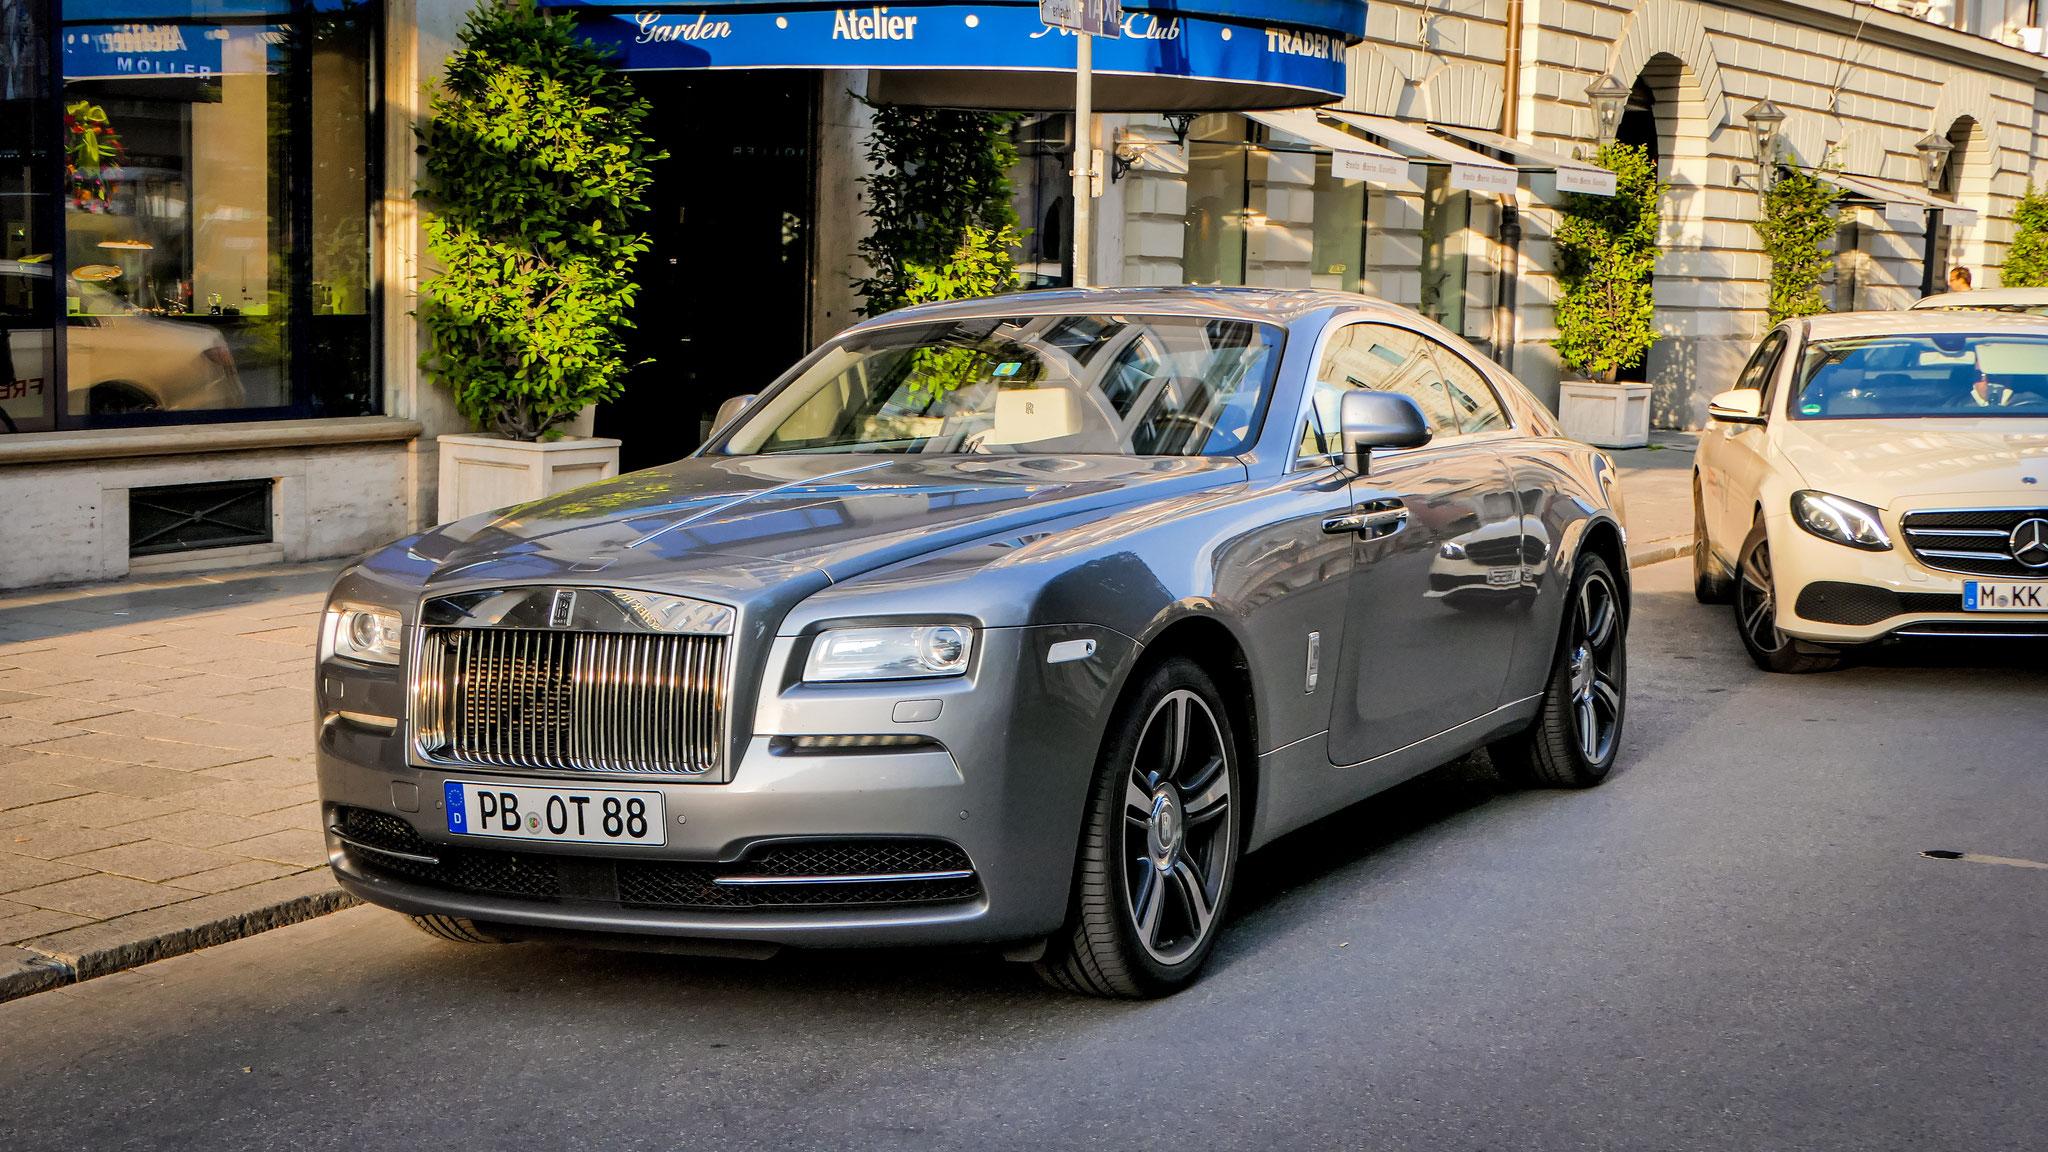 Rolls Royce Wraith - PB-OT-88